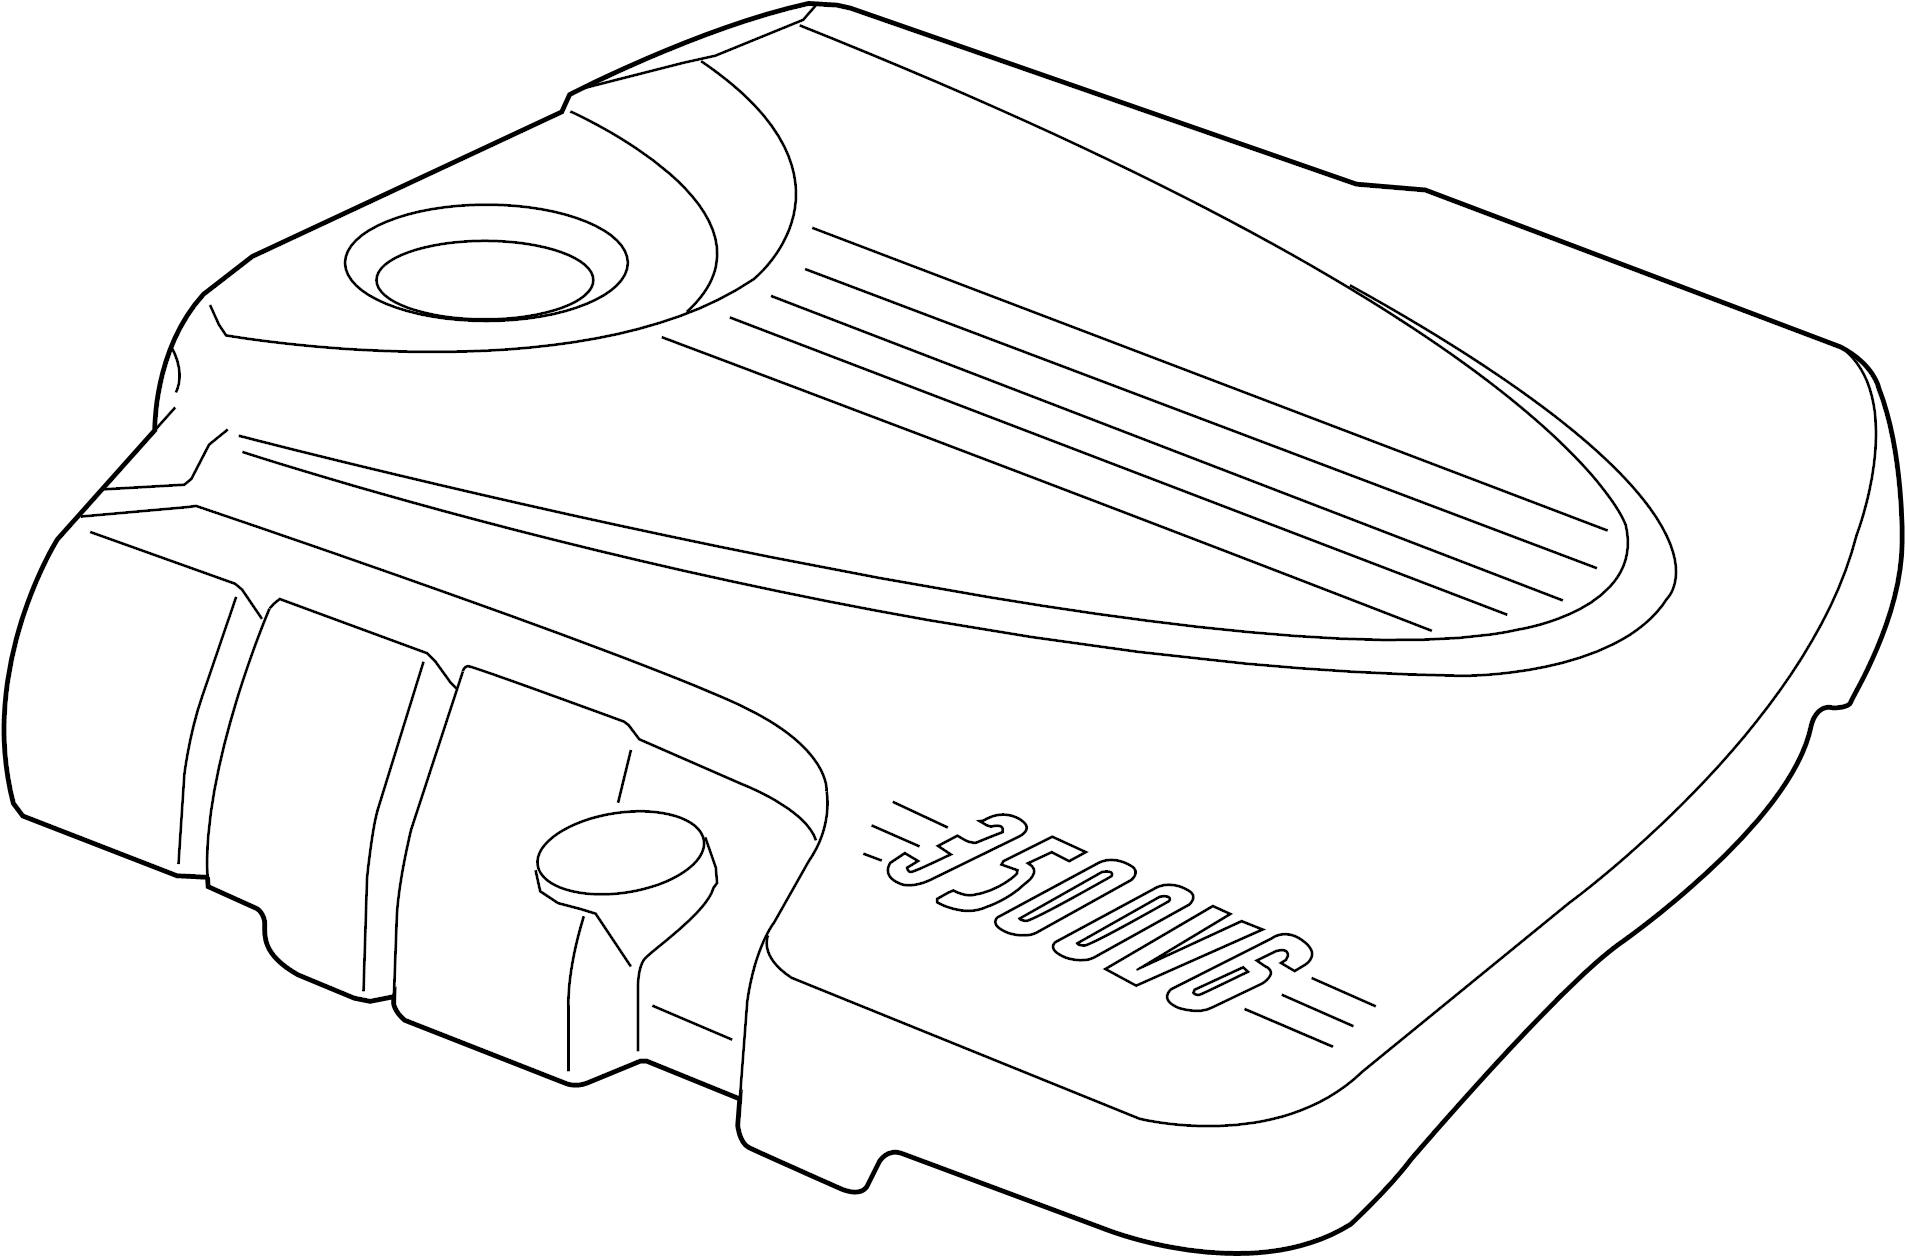 Chevrolet Monte Carlo Engine Cover. 3.5 & 3.9 LITER, 3.5